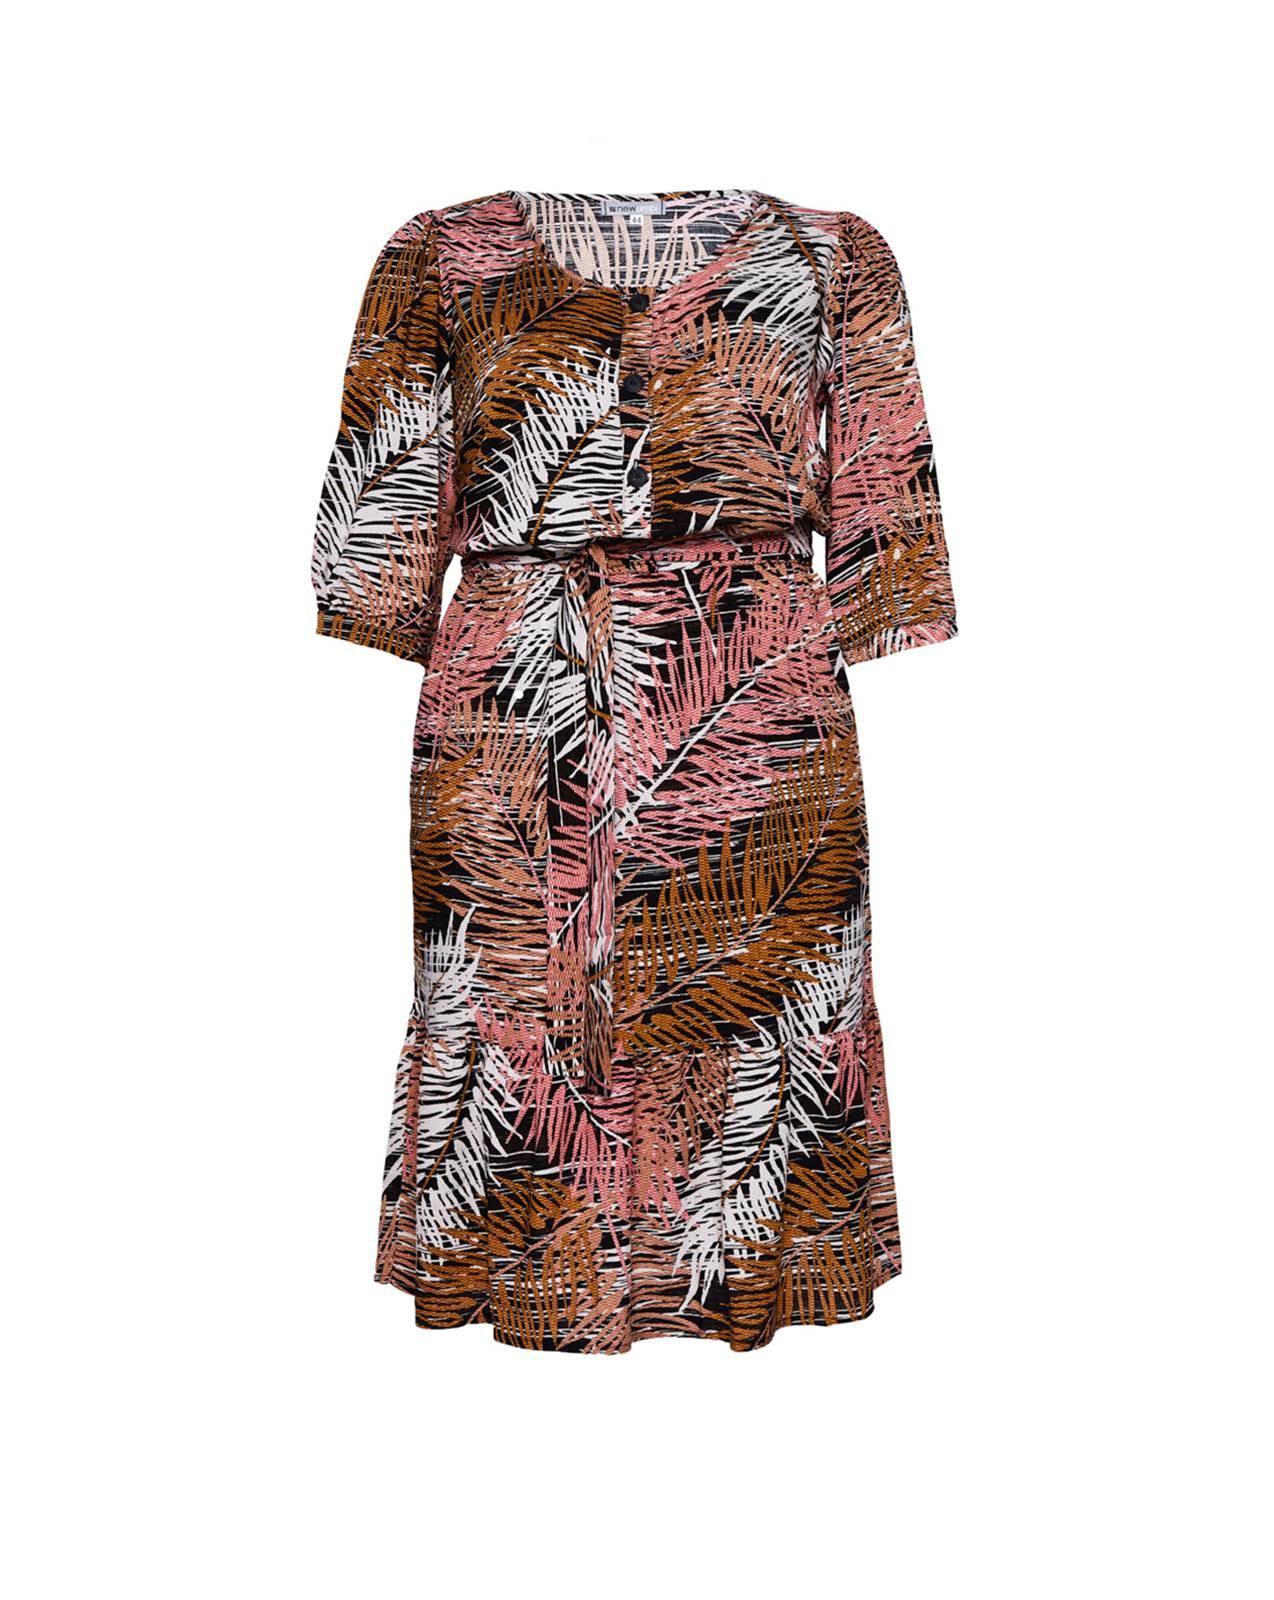 Vestido  goiaba estampado plus size com manga 3/4  Ref. U61721